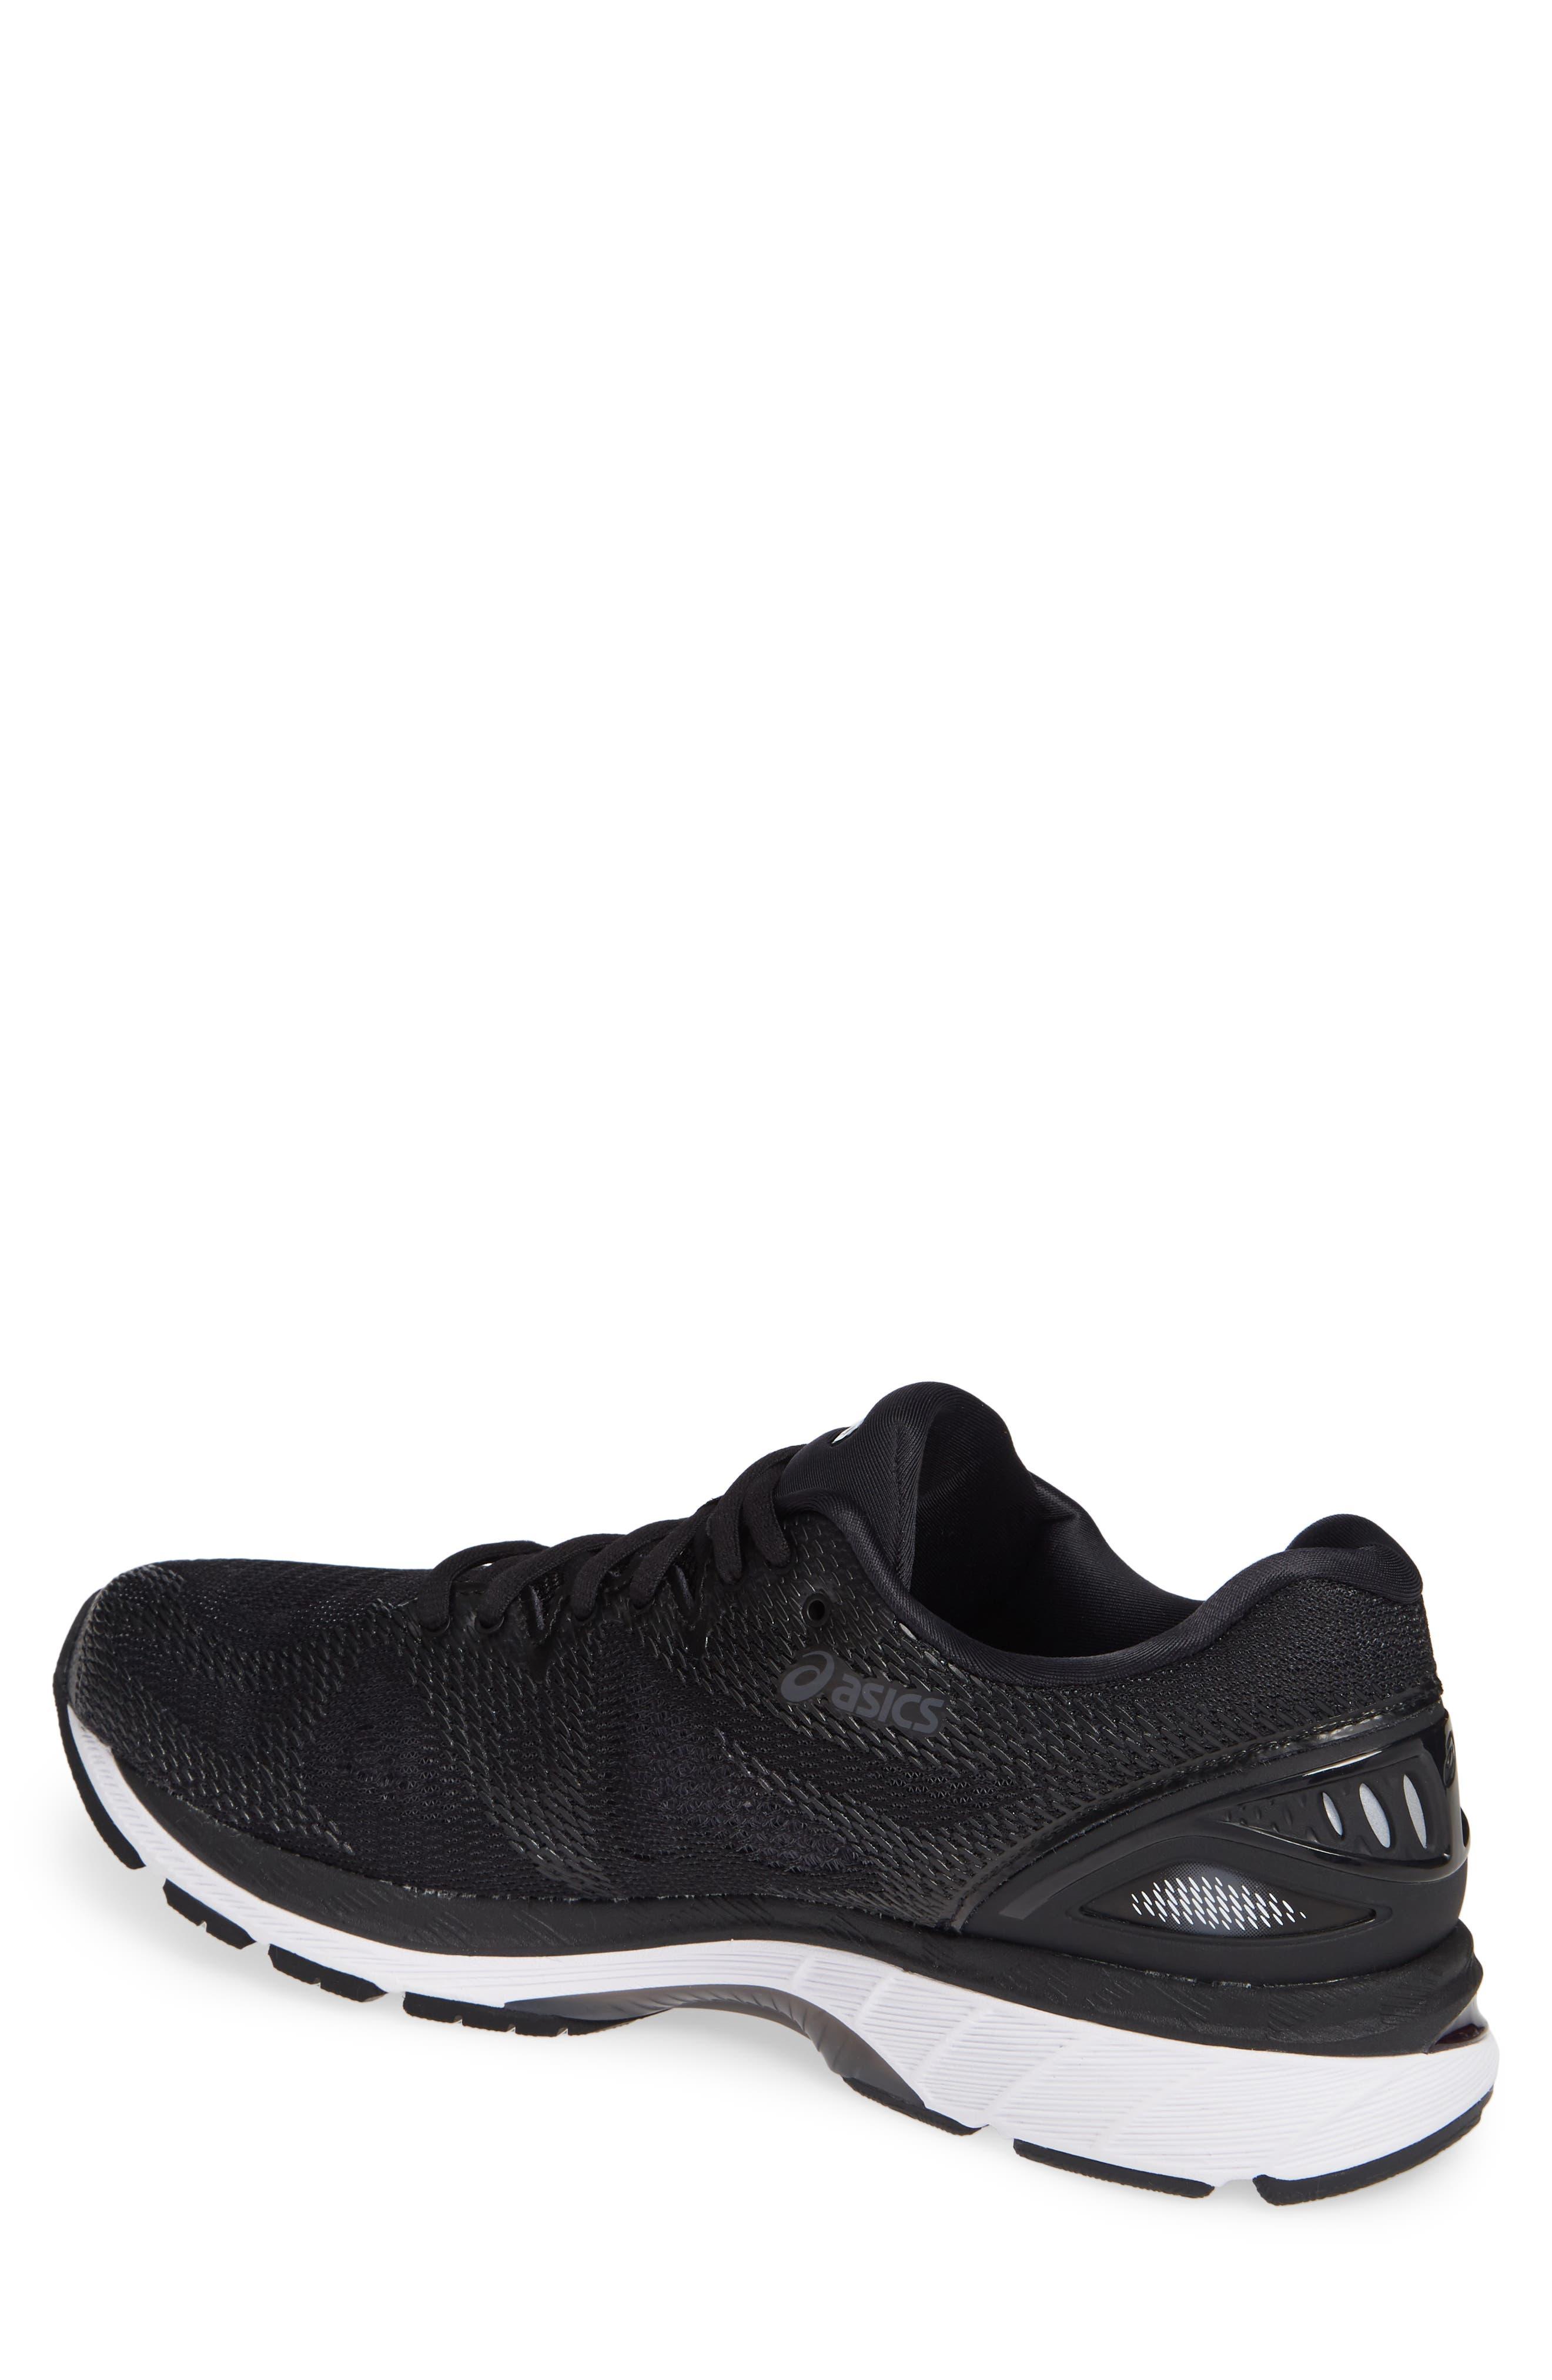 GEL<sup>®</sup>-Nimbus 20 Running Shoe,                             Alternate thumbnail 2, color,                             BLACK/ WHITE/ CARBON